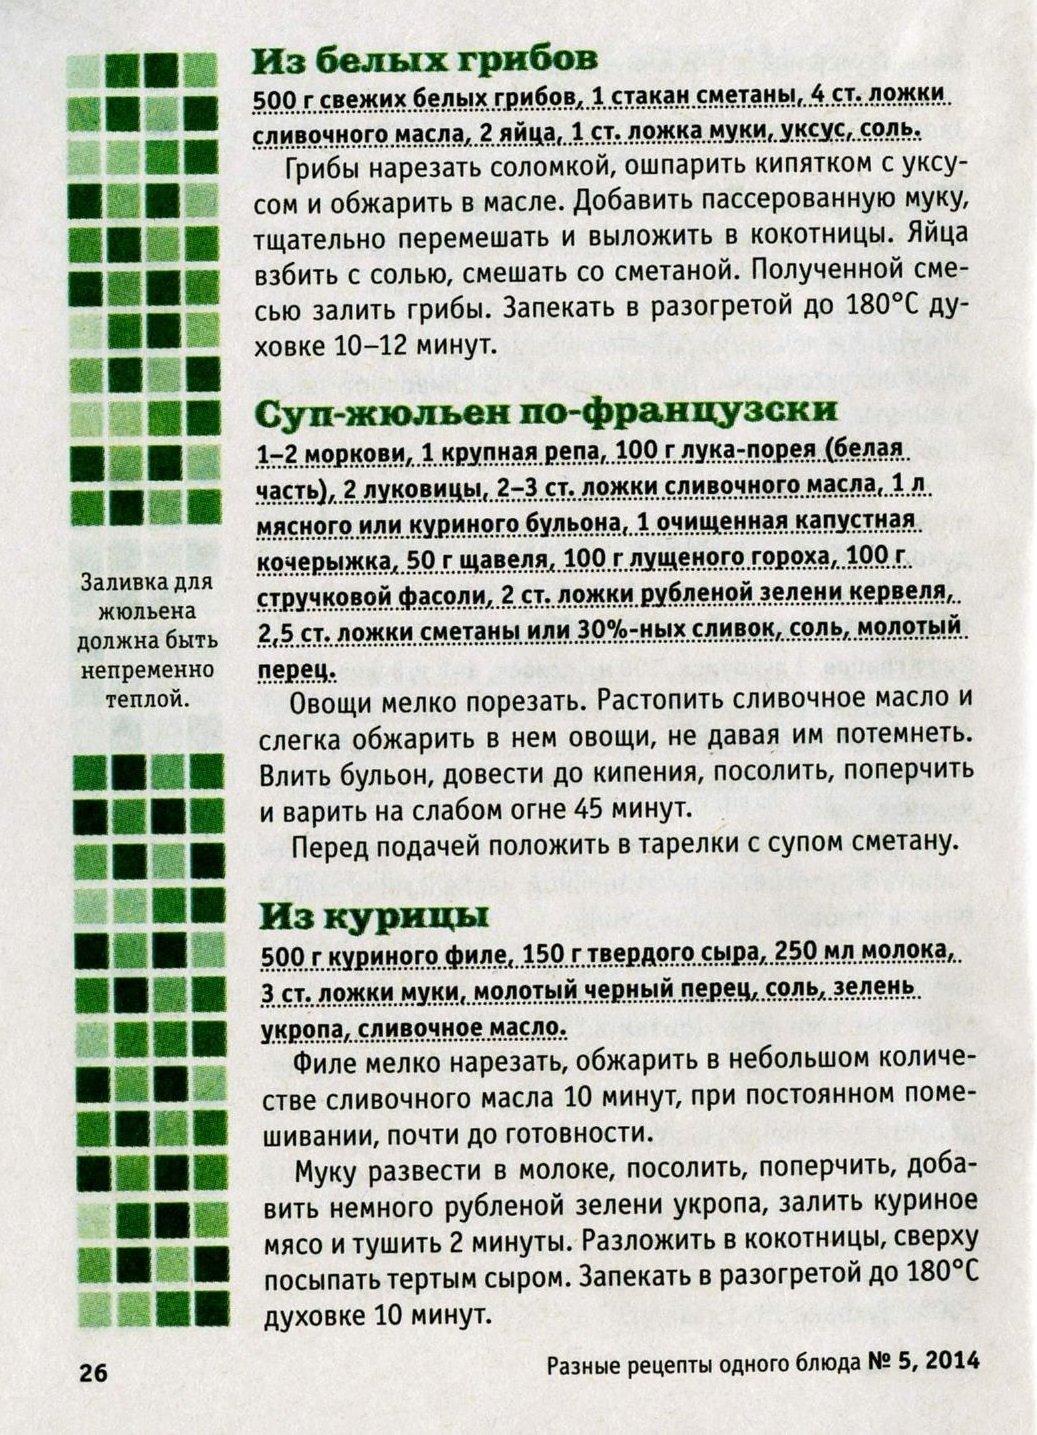 http://images.vfl.ru/ii/1406913601/3f25d2f0/5869849.jpg